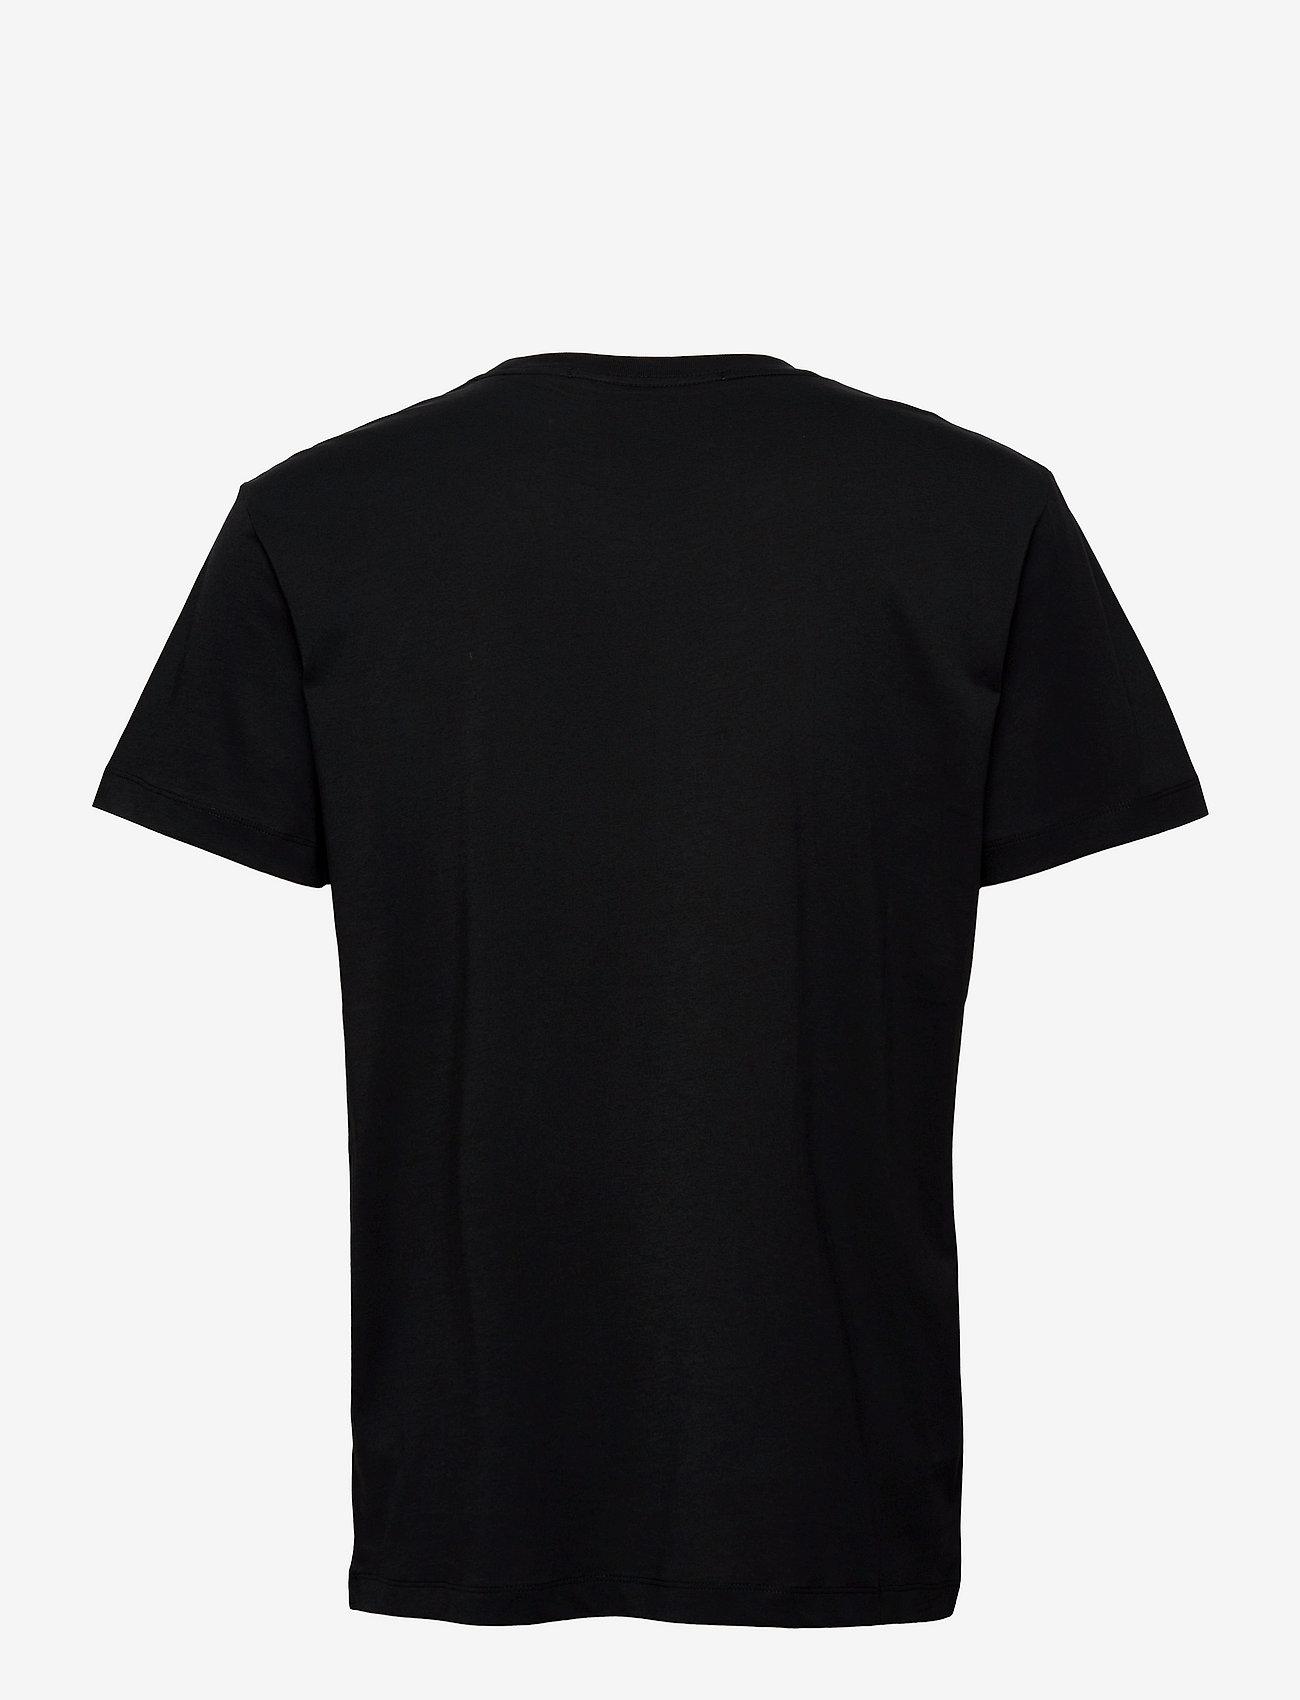 Calvin Klein Jeans - CK MONOGRAM WATERBASE TEE - korte mouwen - ck black - 1